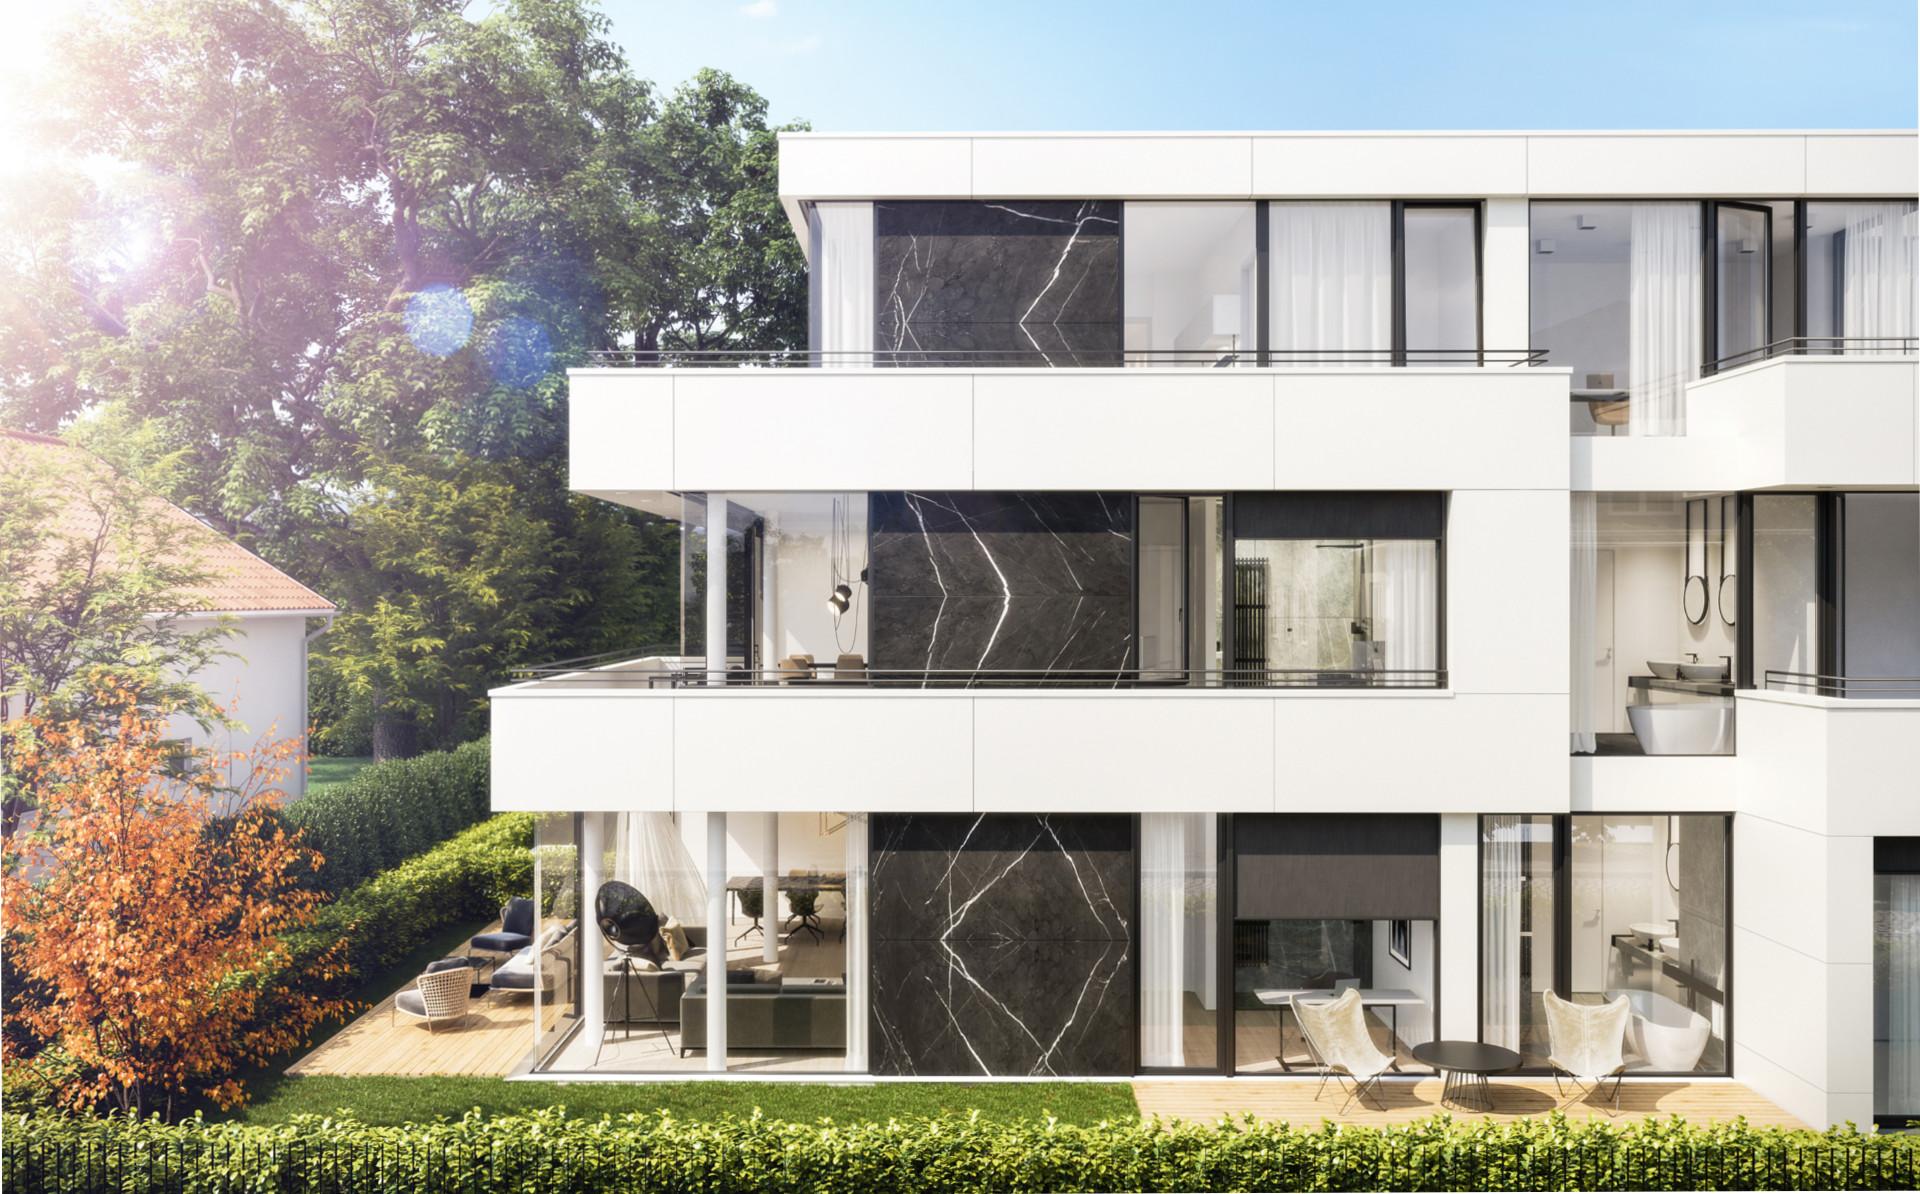 L HOMES Flemingstraße_Fassadendetail_1920x1200